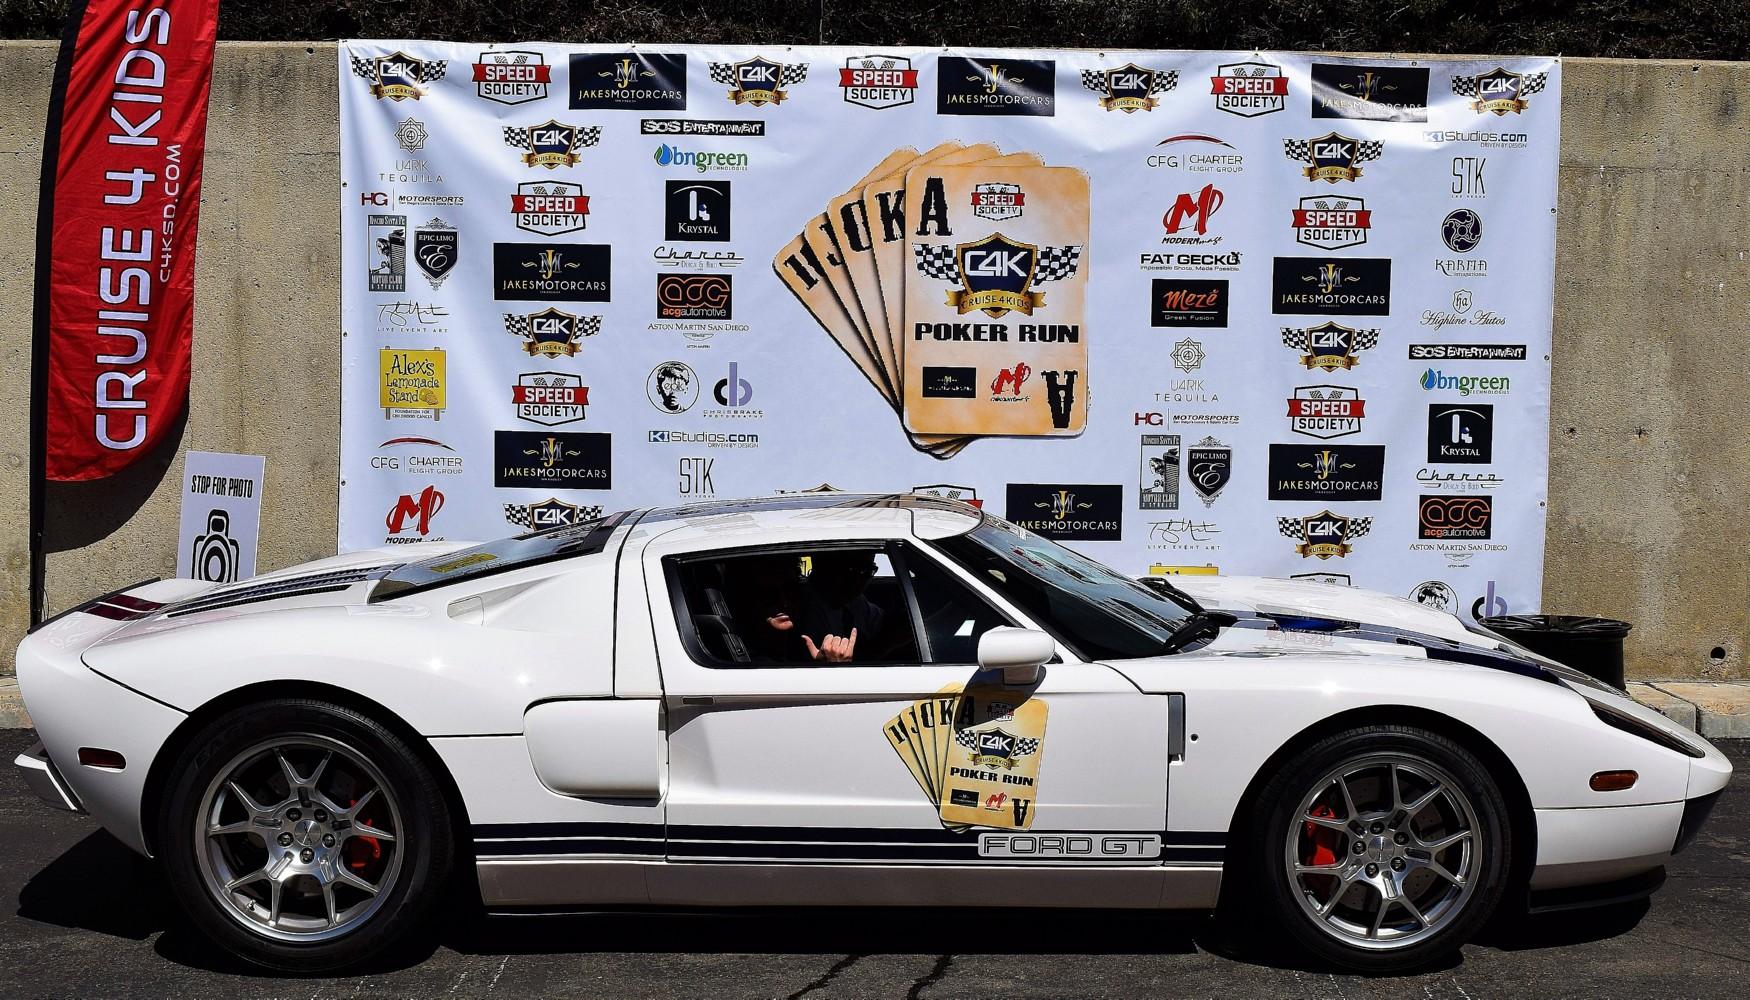 Poker Run 2017 Banner Photos - 7.jpg